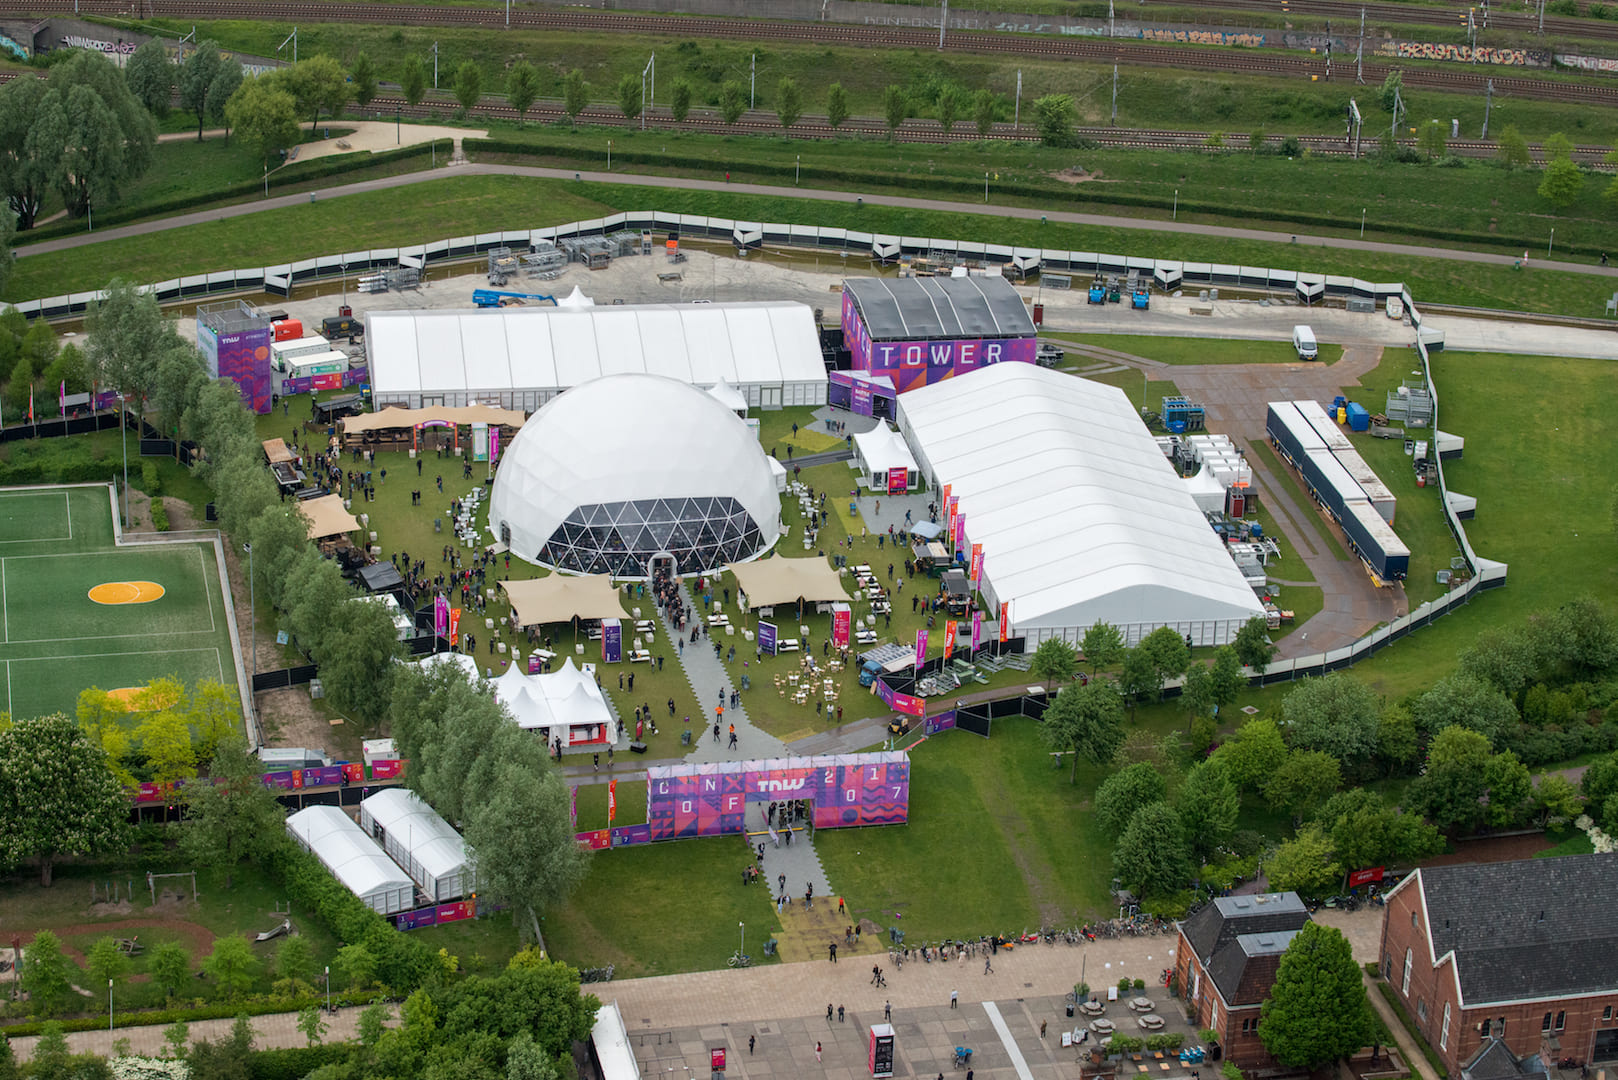 evenement-tent-amsterdam-westergasfabriek-festival-06